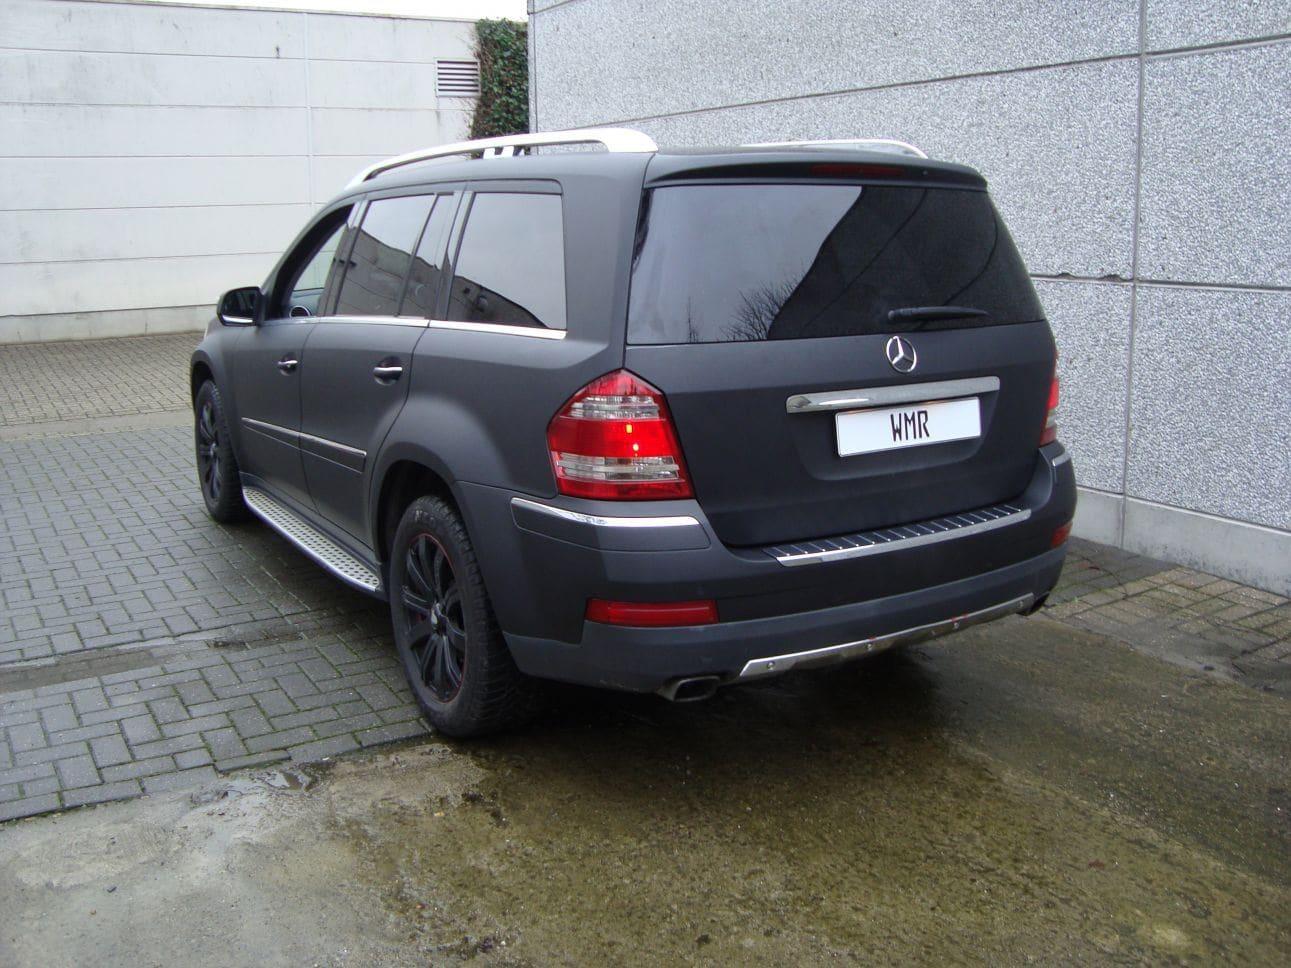 Mercedes GL met Mat Zwarte Wrap, Carwrapping door Wrapmyride.nu Foto-nr:6293, ©2021